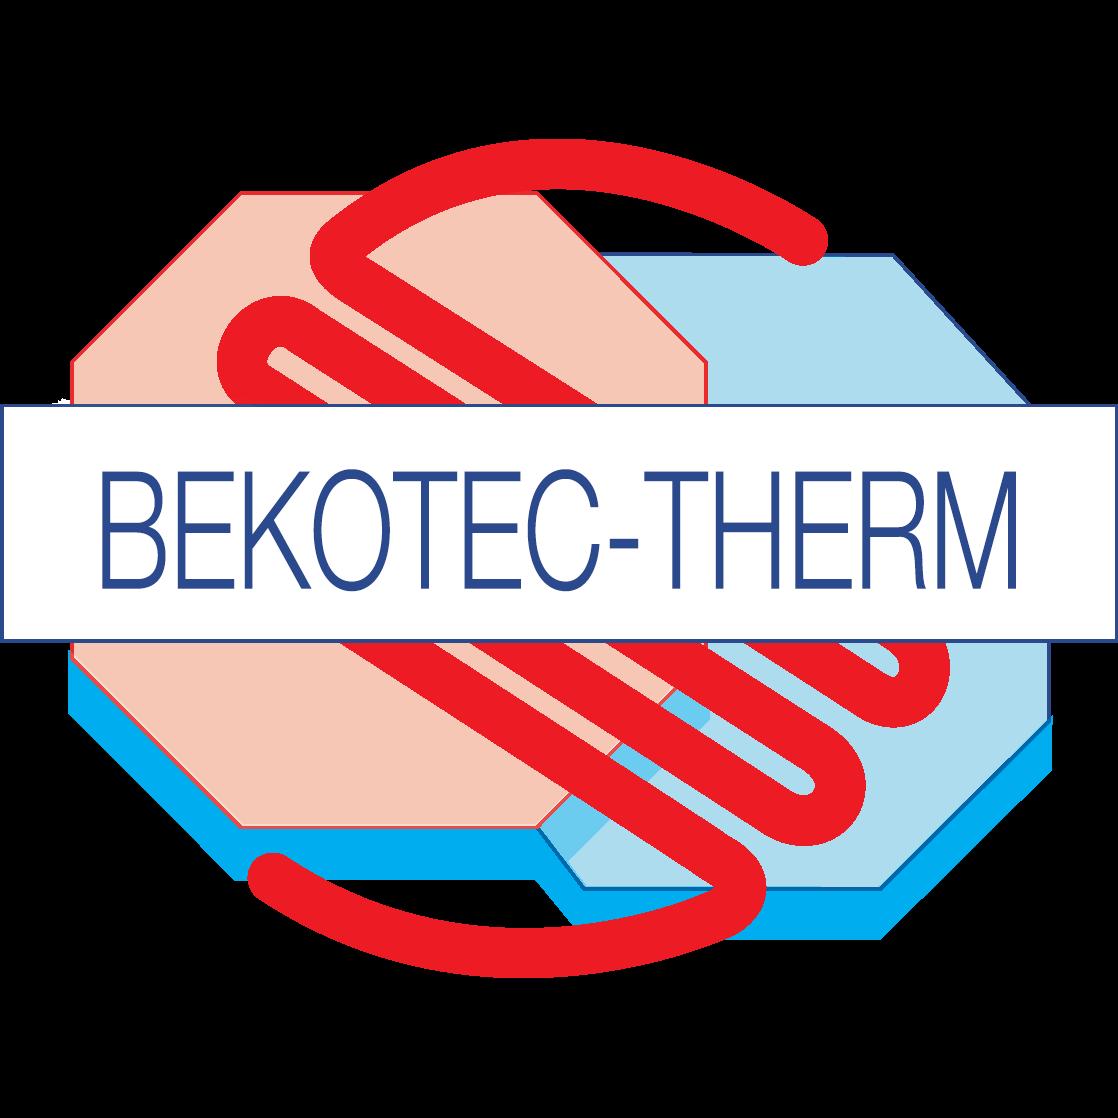 Vloerverwarming Systeem Bekotec-Therm